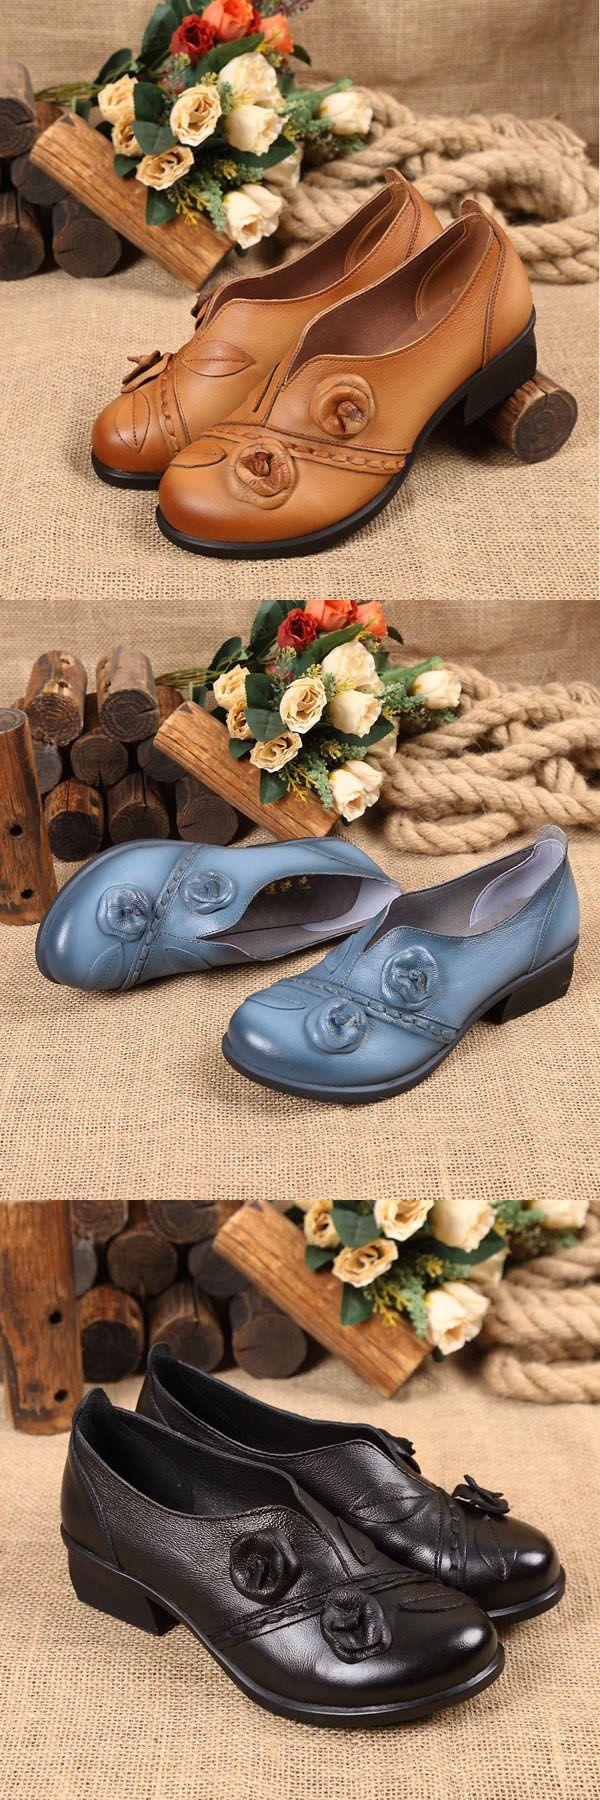 US$27.62  SOCOFY Flower Retro Mid Heel Original Folkways Handmade Shoes_Handmade Flats_Women's Leather Flats